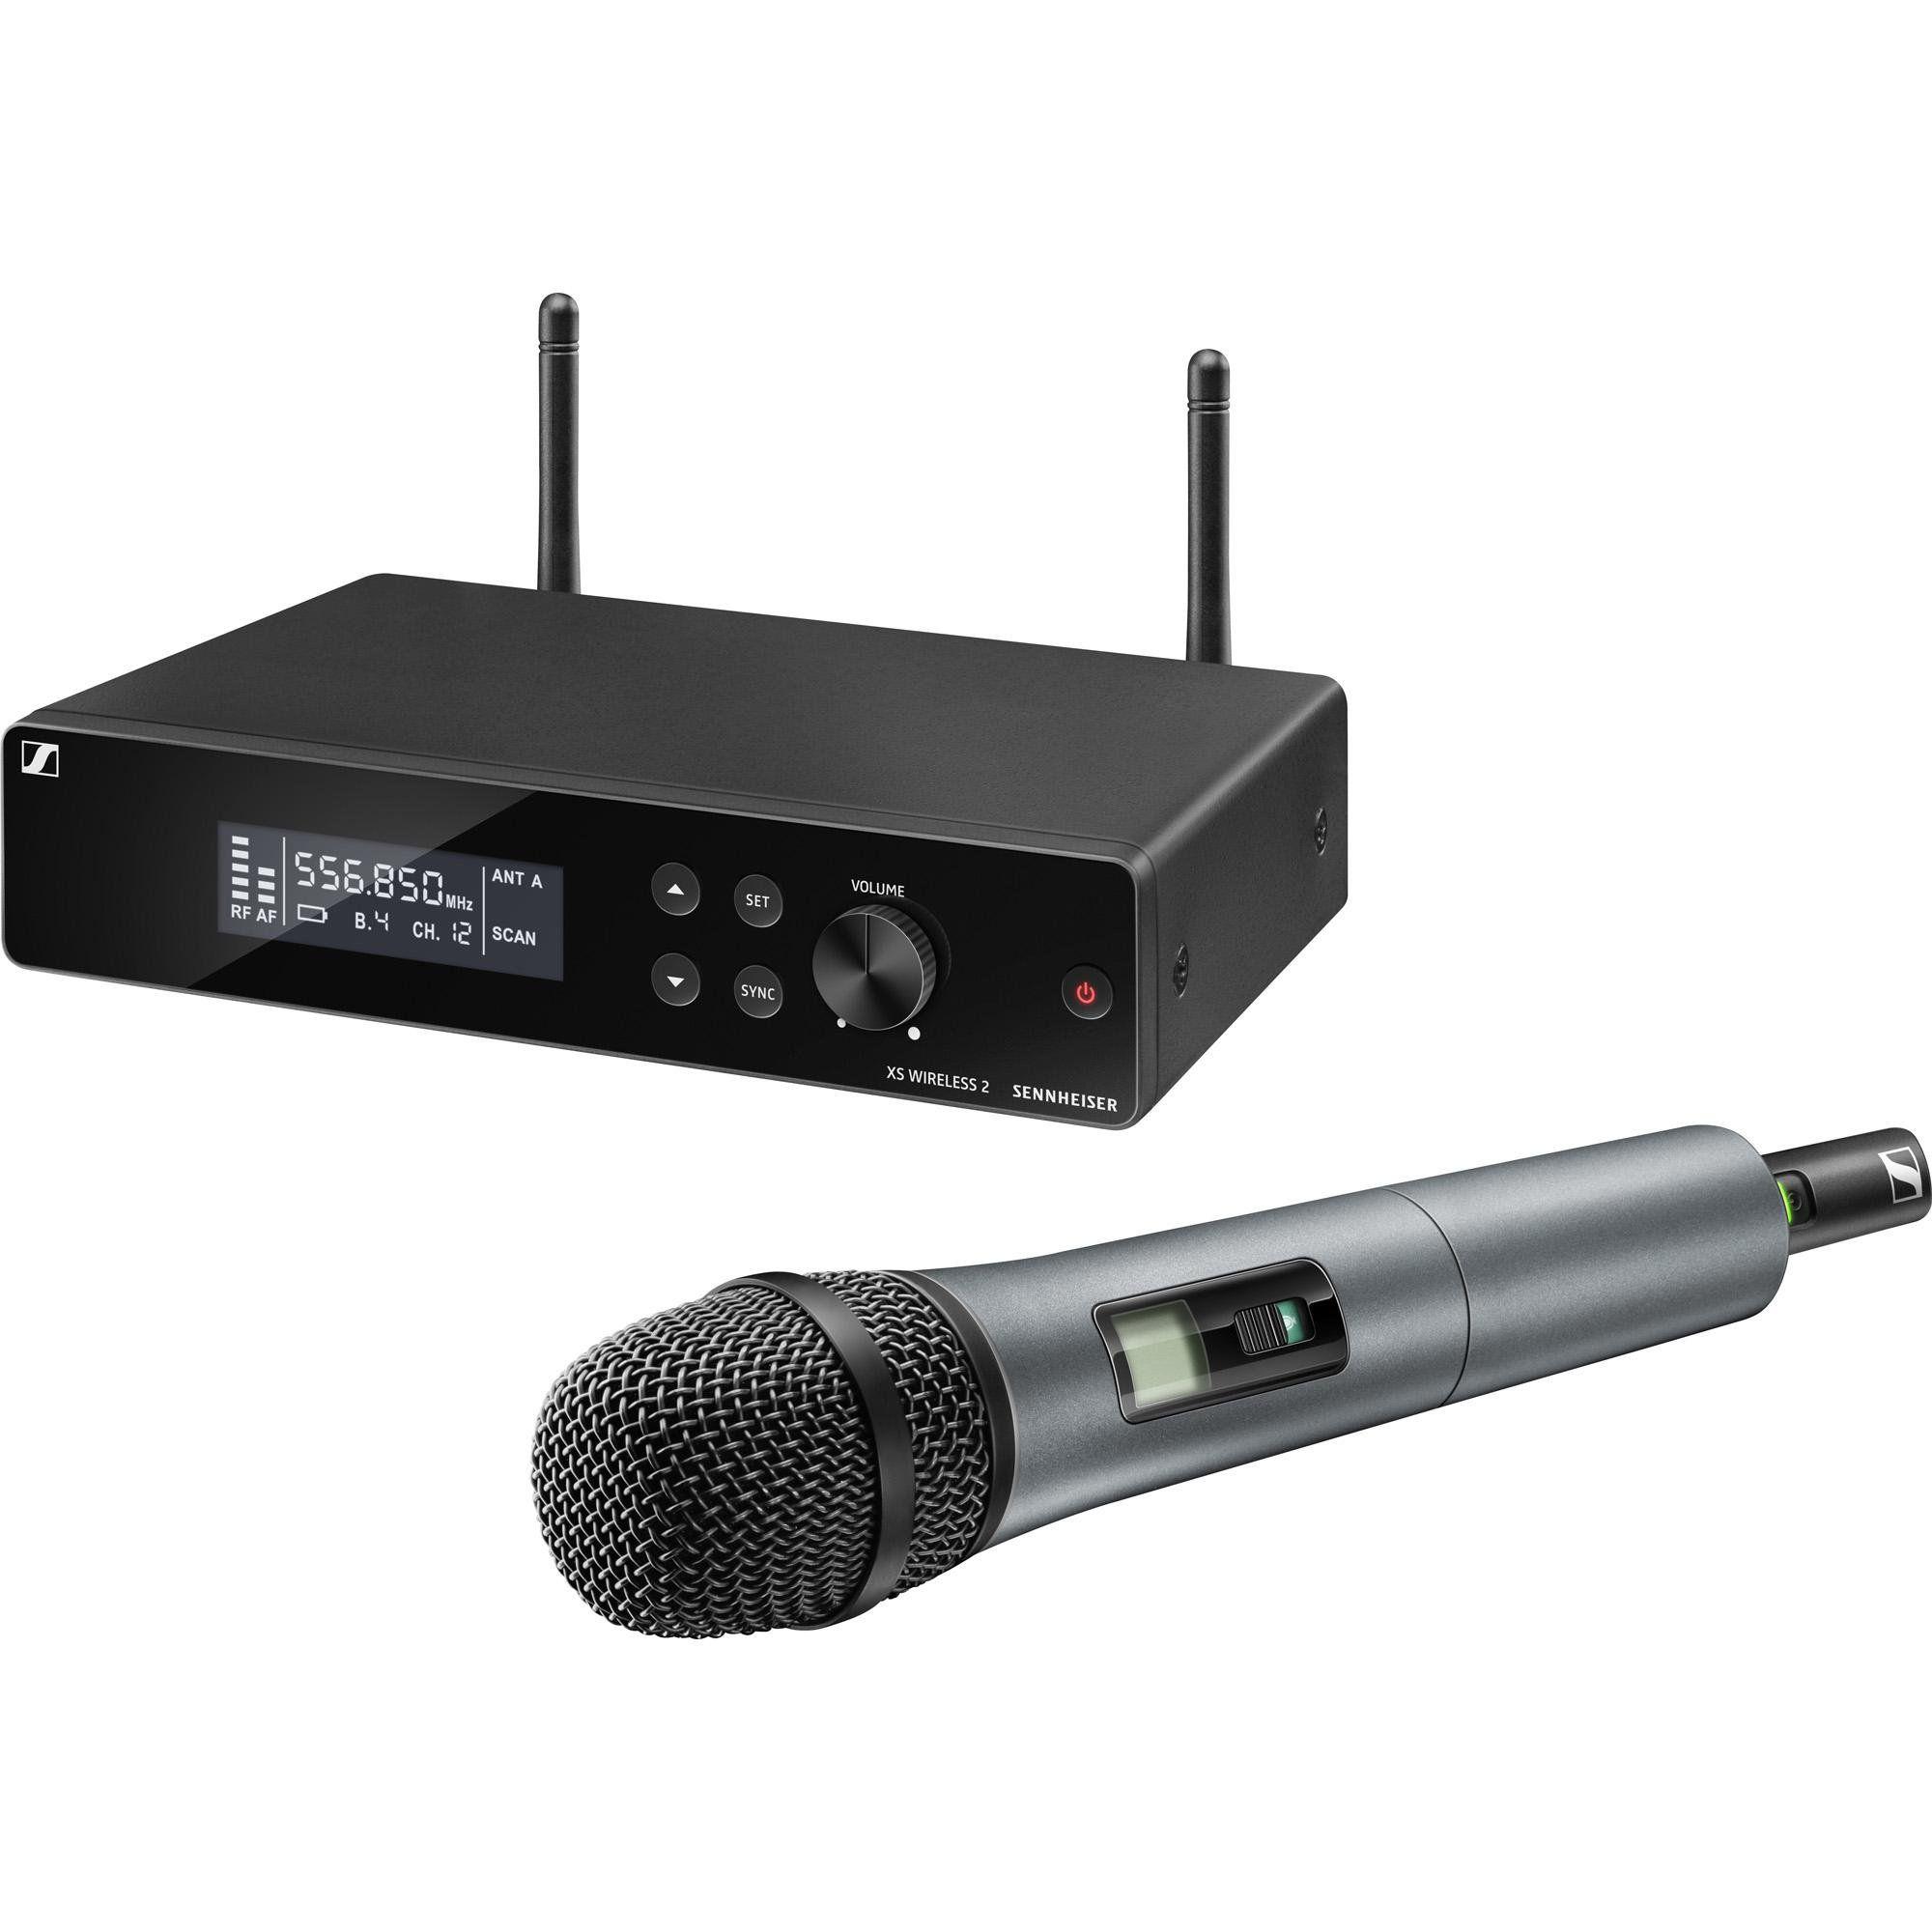 Microfone sem Fio XSW2-835A Sennheiser